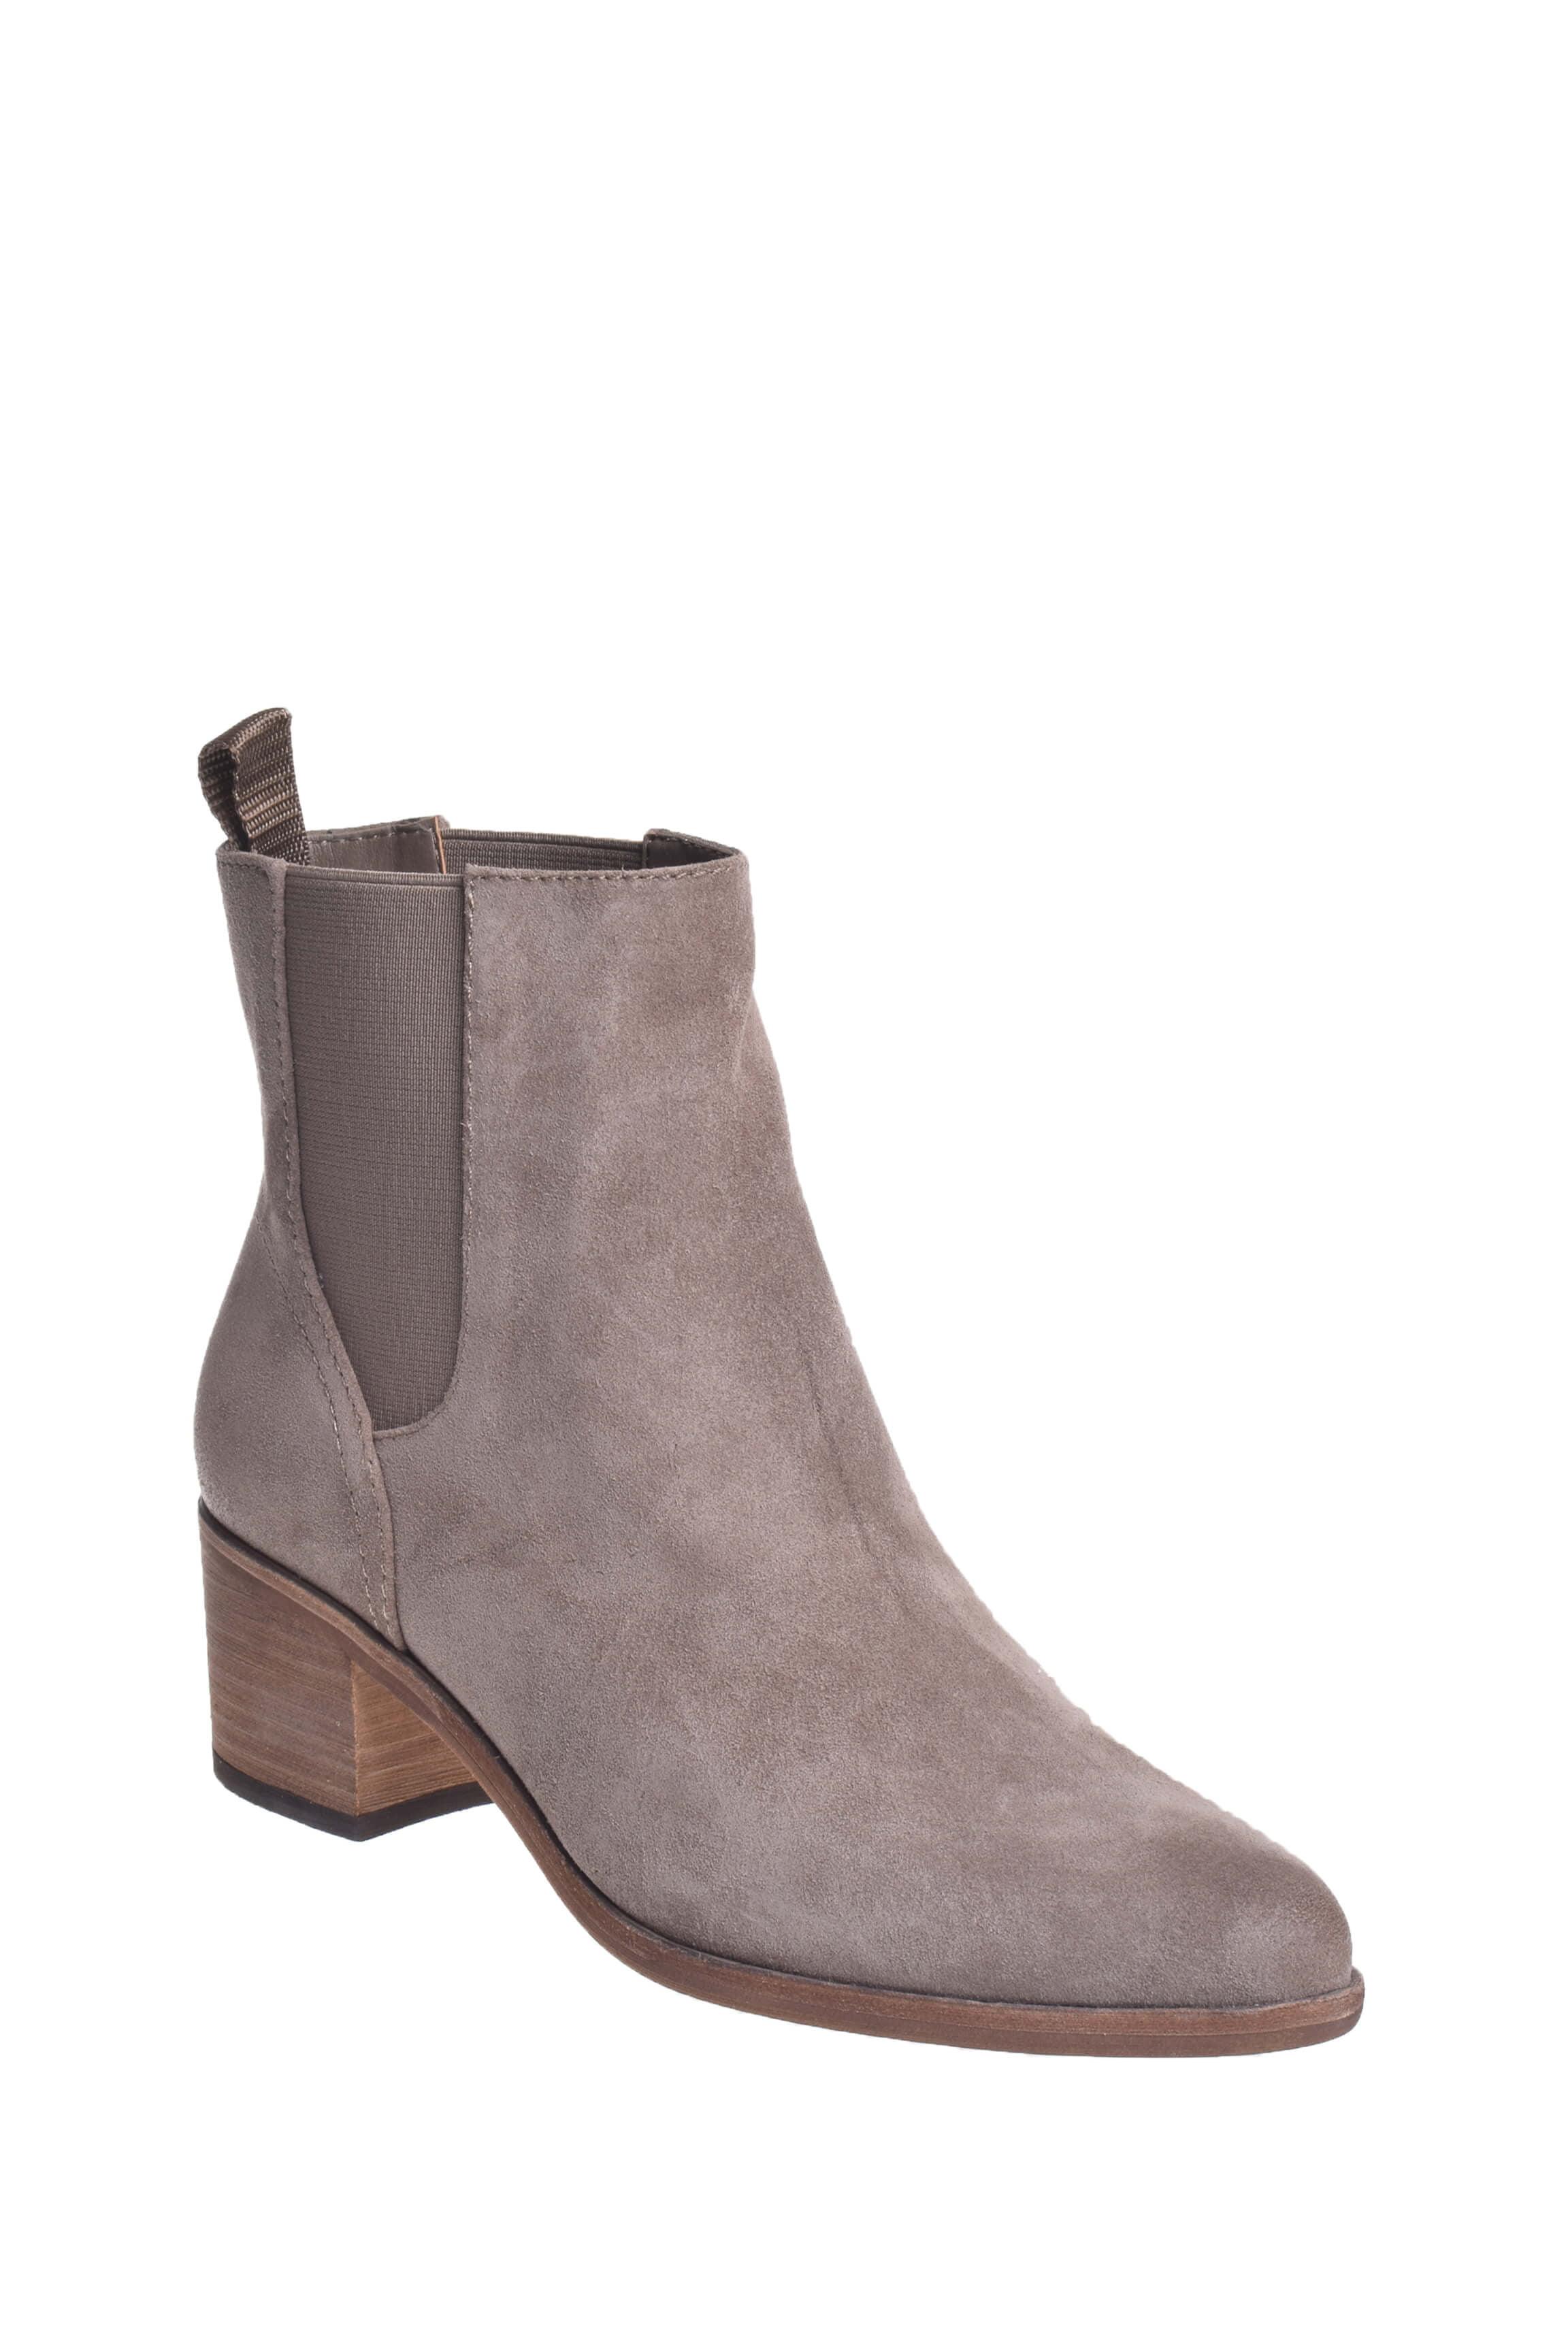 Dolce Vita Colbey Mid-Heel Boot